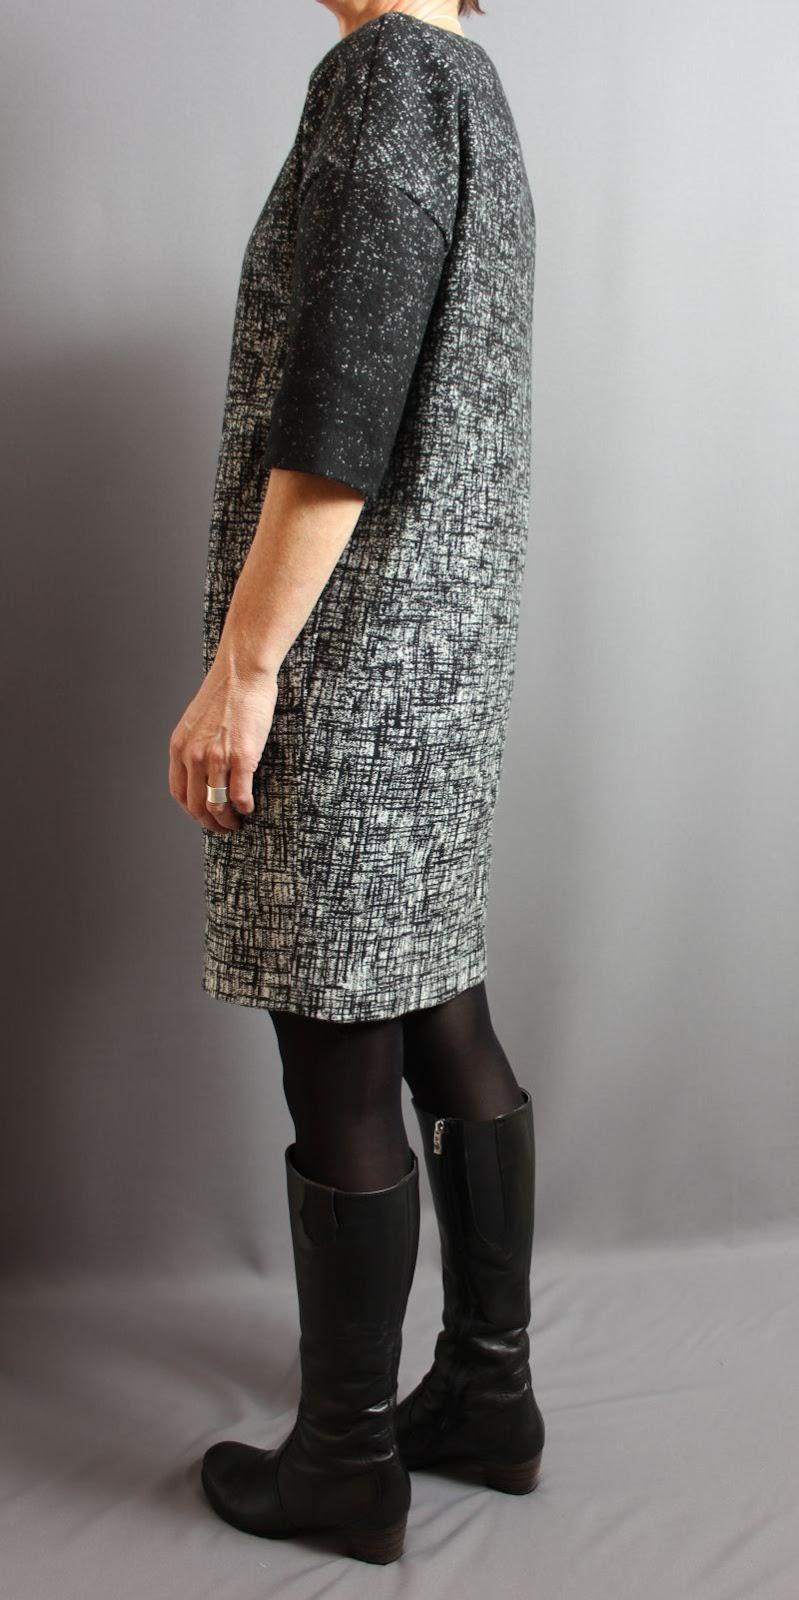 PepitaStoff Stil 23111 PepitaStoff Kleid Stil und und lTF1cKJ